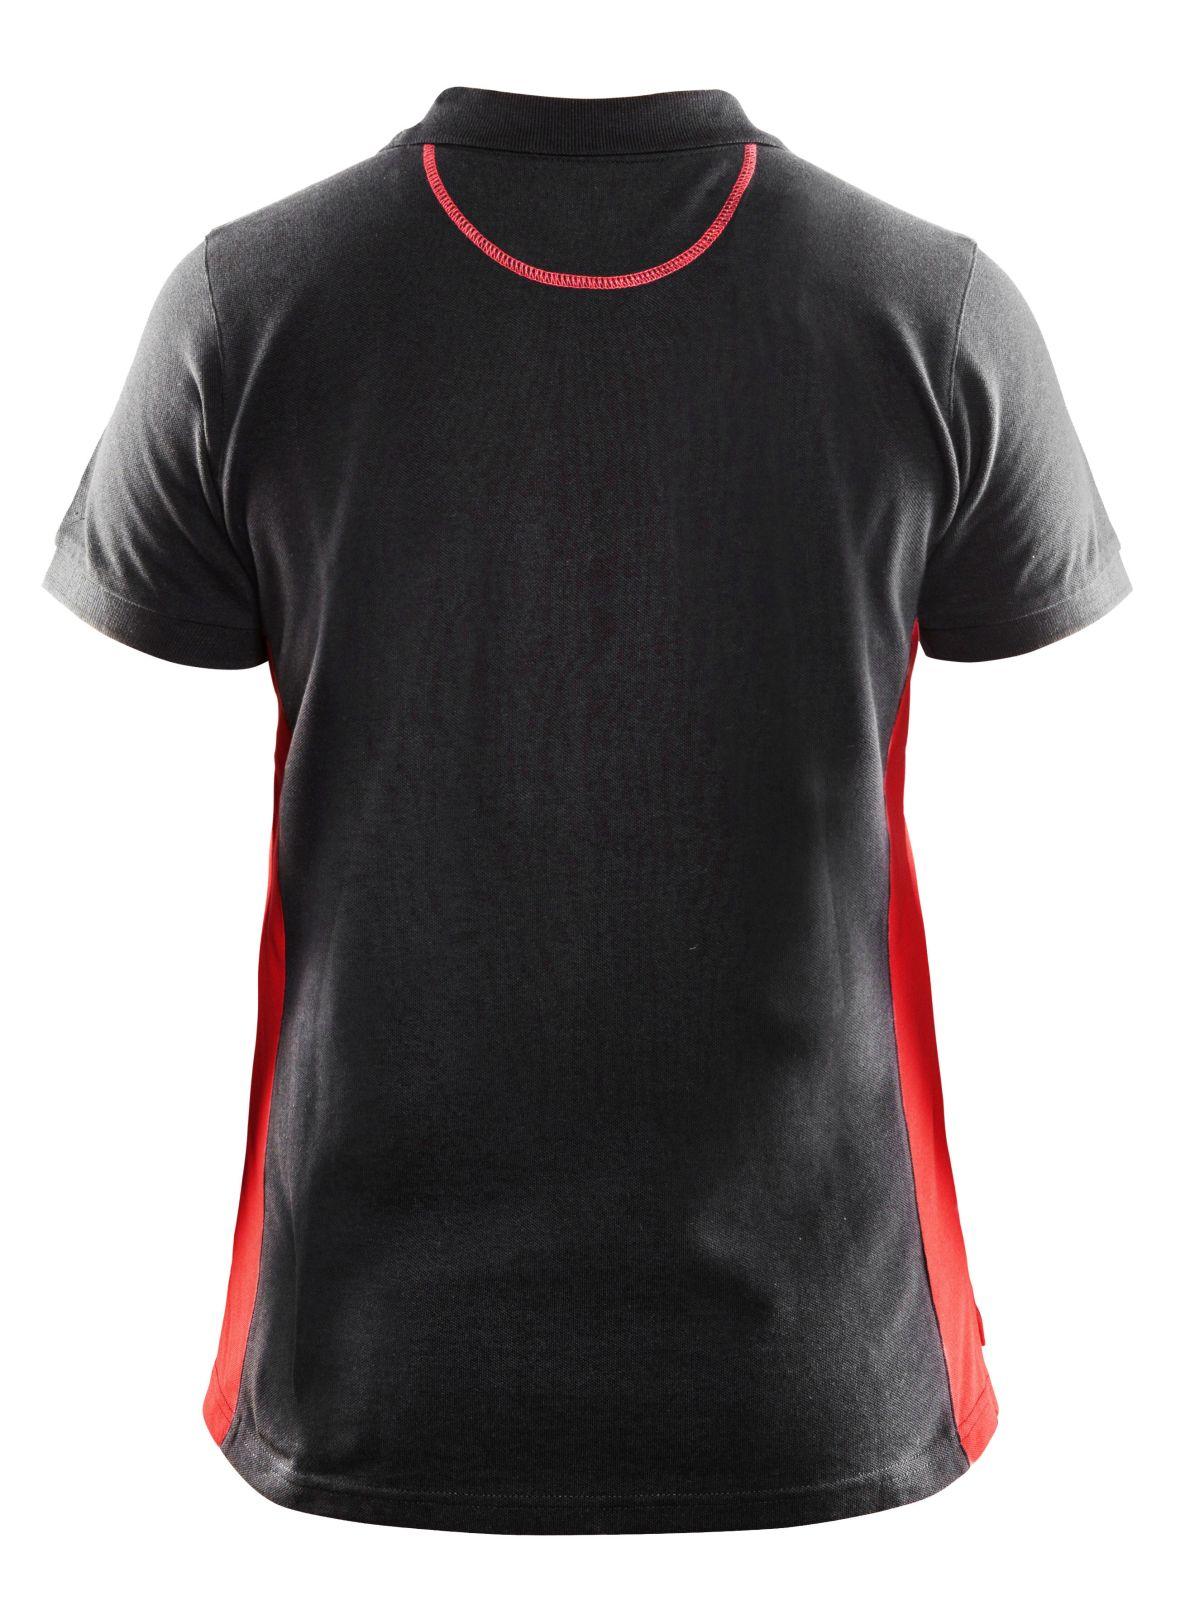 Blaklader Dames polo shirts 33901050 zwart-rood(9956)